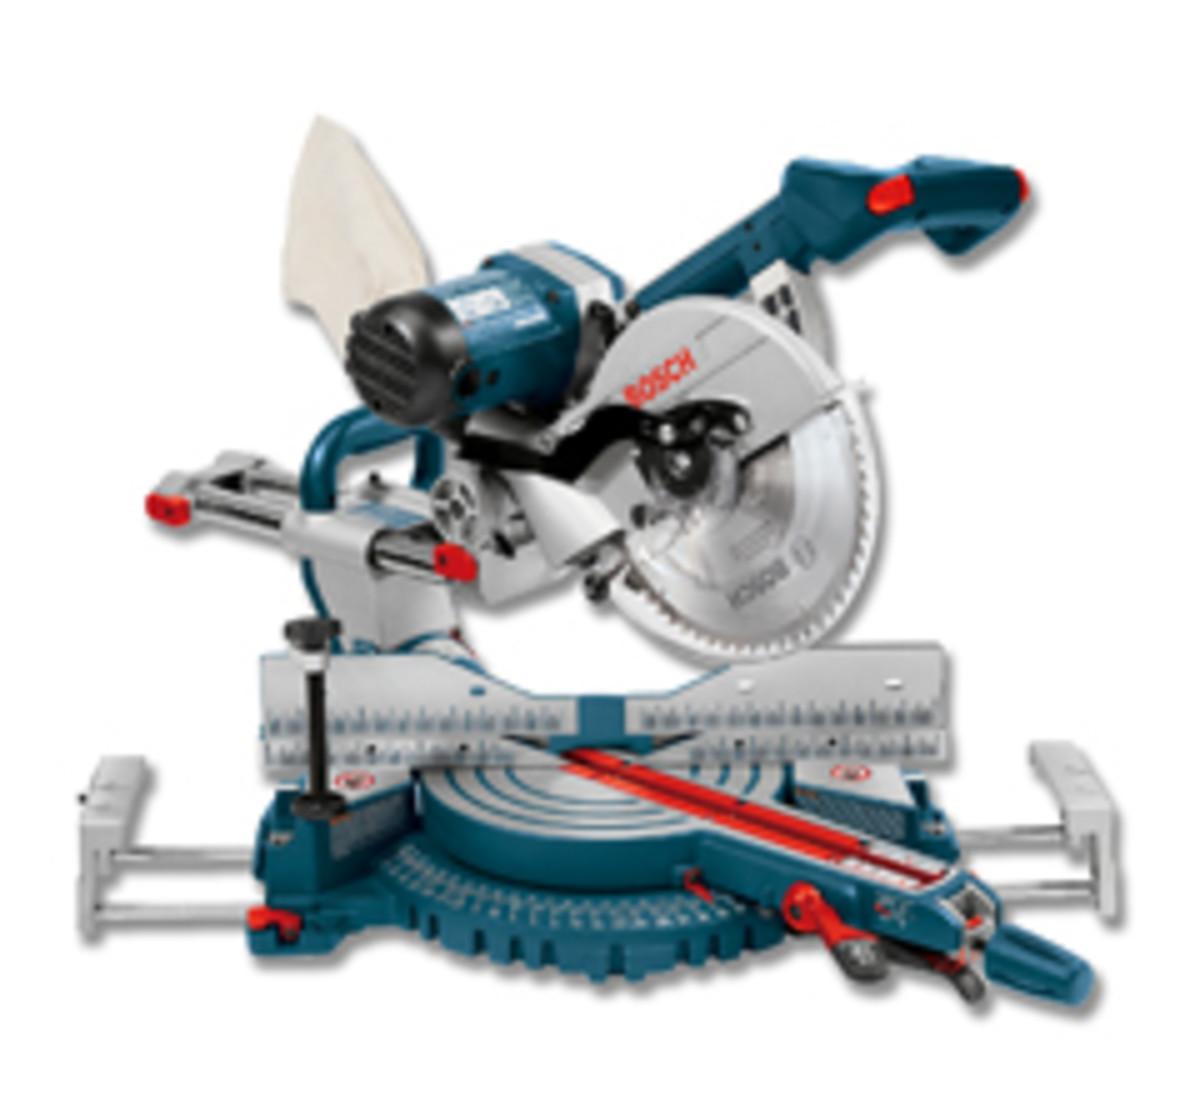 "The Bosch 10"" dual-bevel sliding miter saw, model 4310."